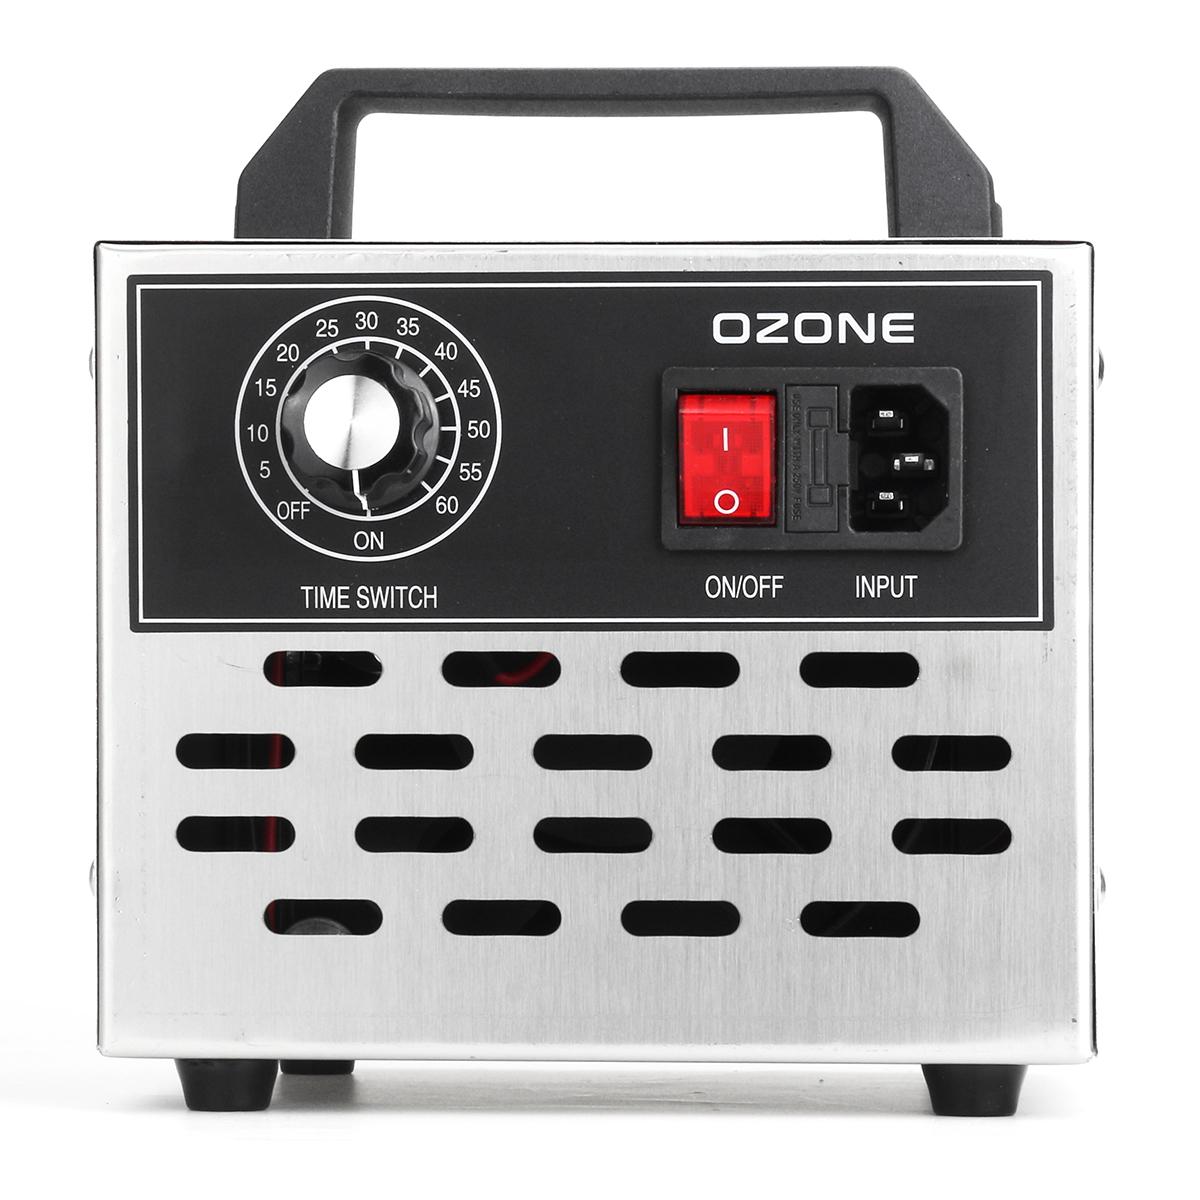 220V 3.5g/5g/7g/10g Ozone Generator Air Purifier Disinfection Cleaner Sterilizer Machine